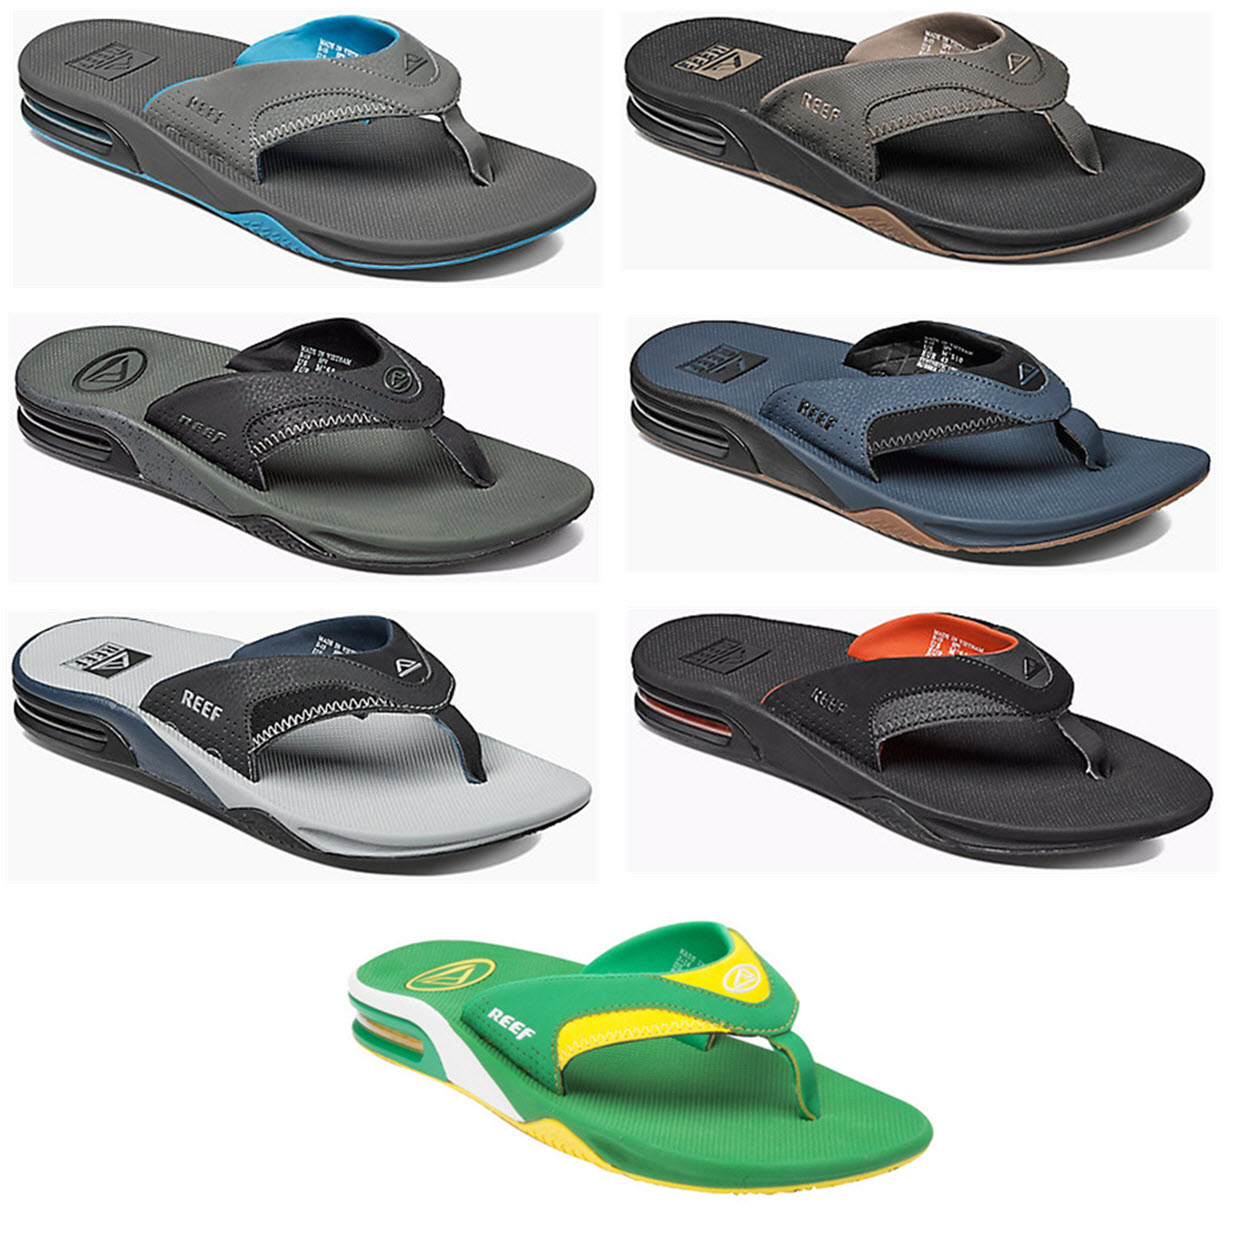 75d5648f1 Sentinel Reef Sandal - Fanning Flip Flops - Mick Fanning Pro Model